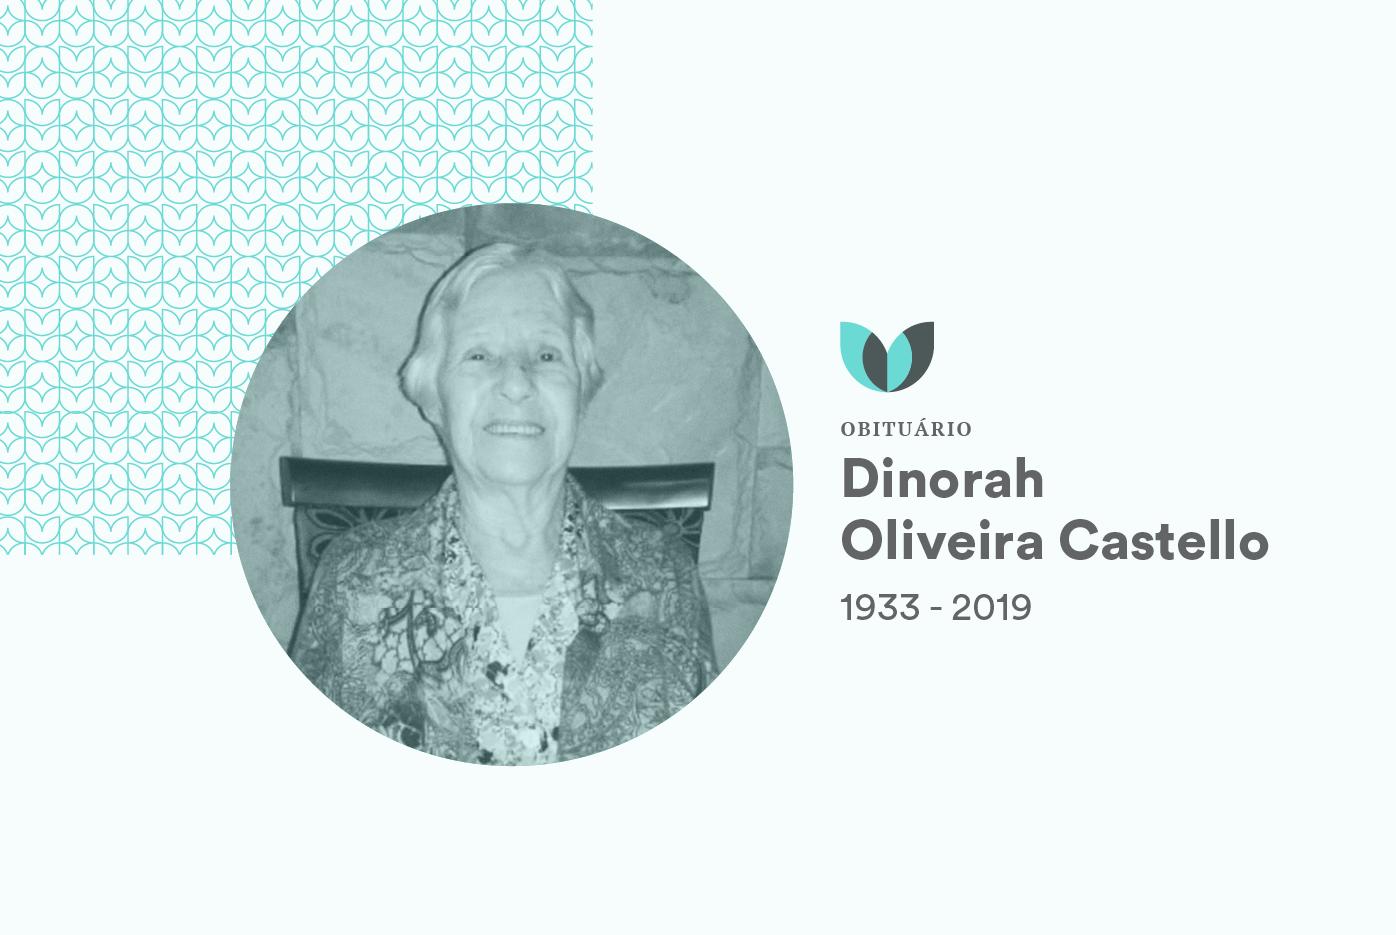 Obituario-Dinorah-Squarespace.png